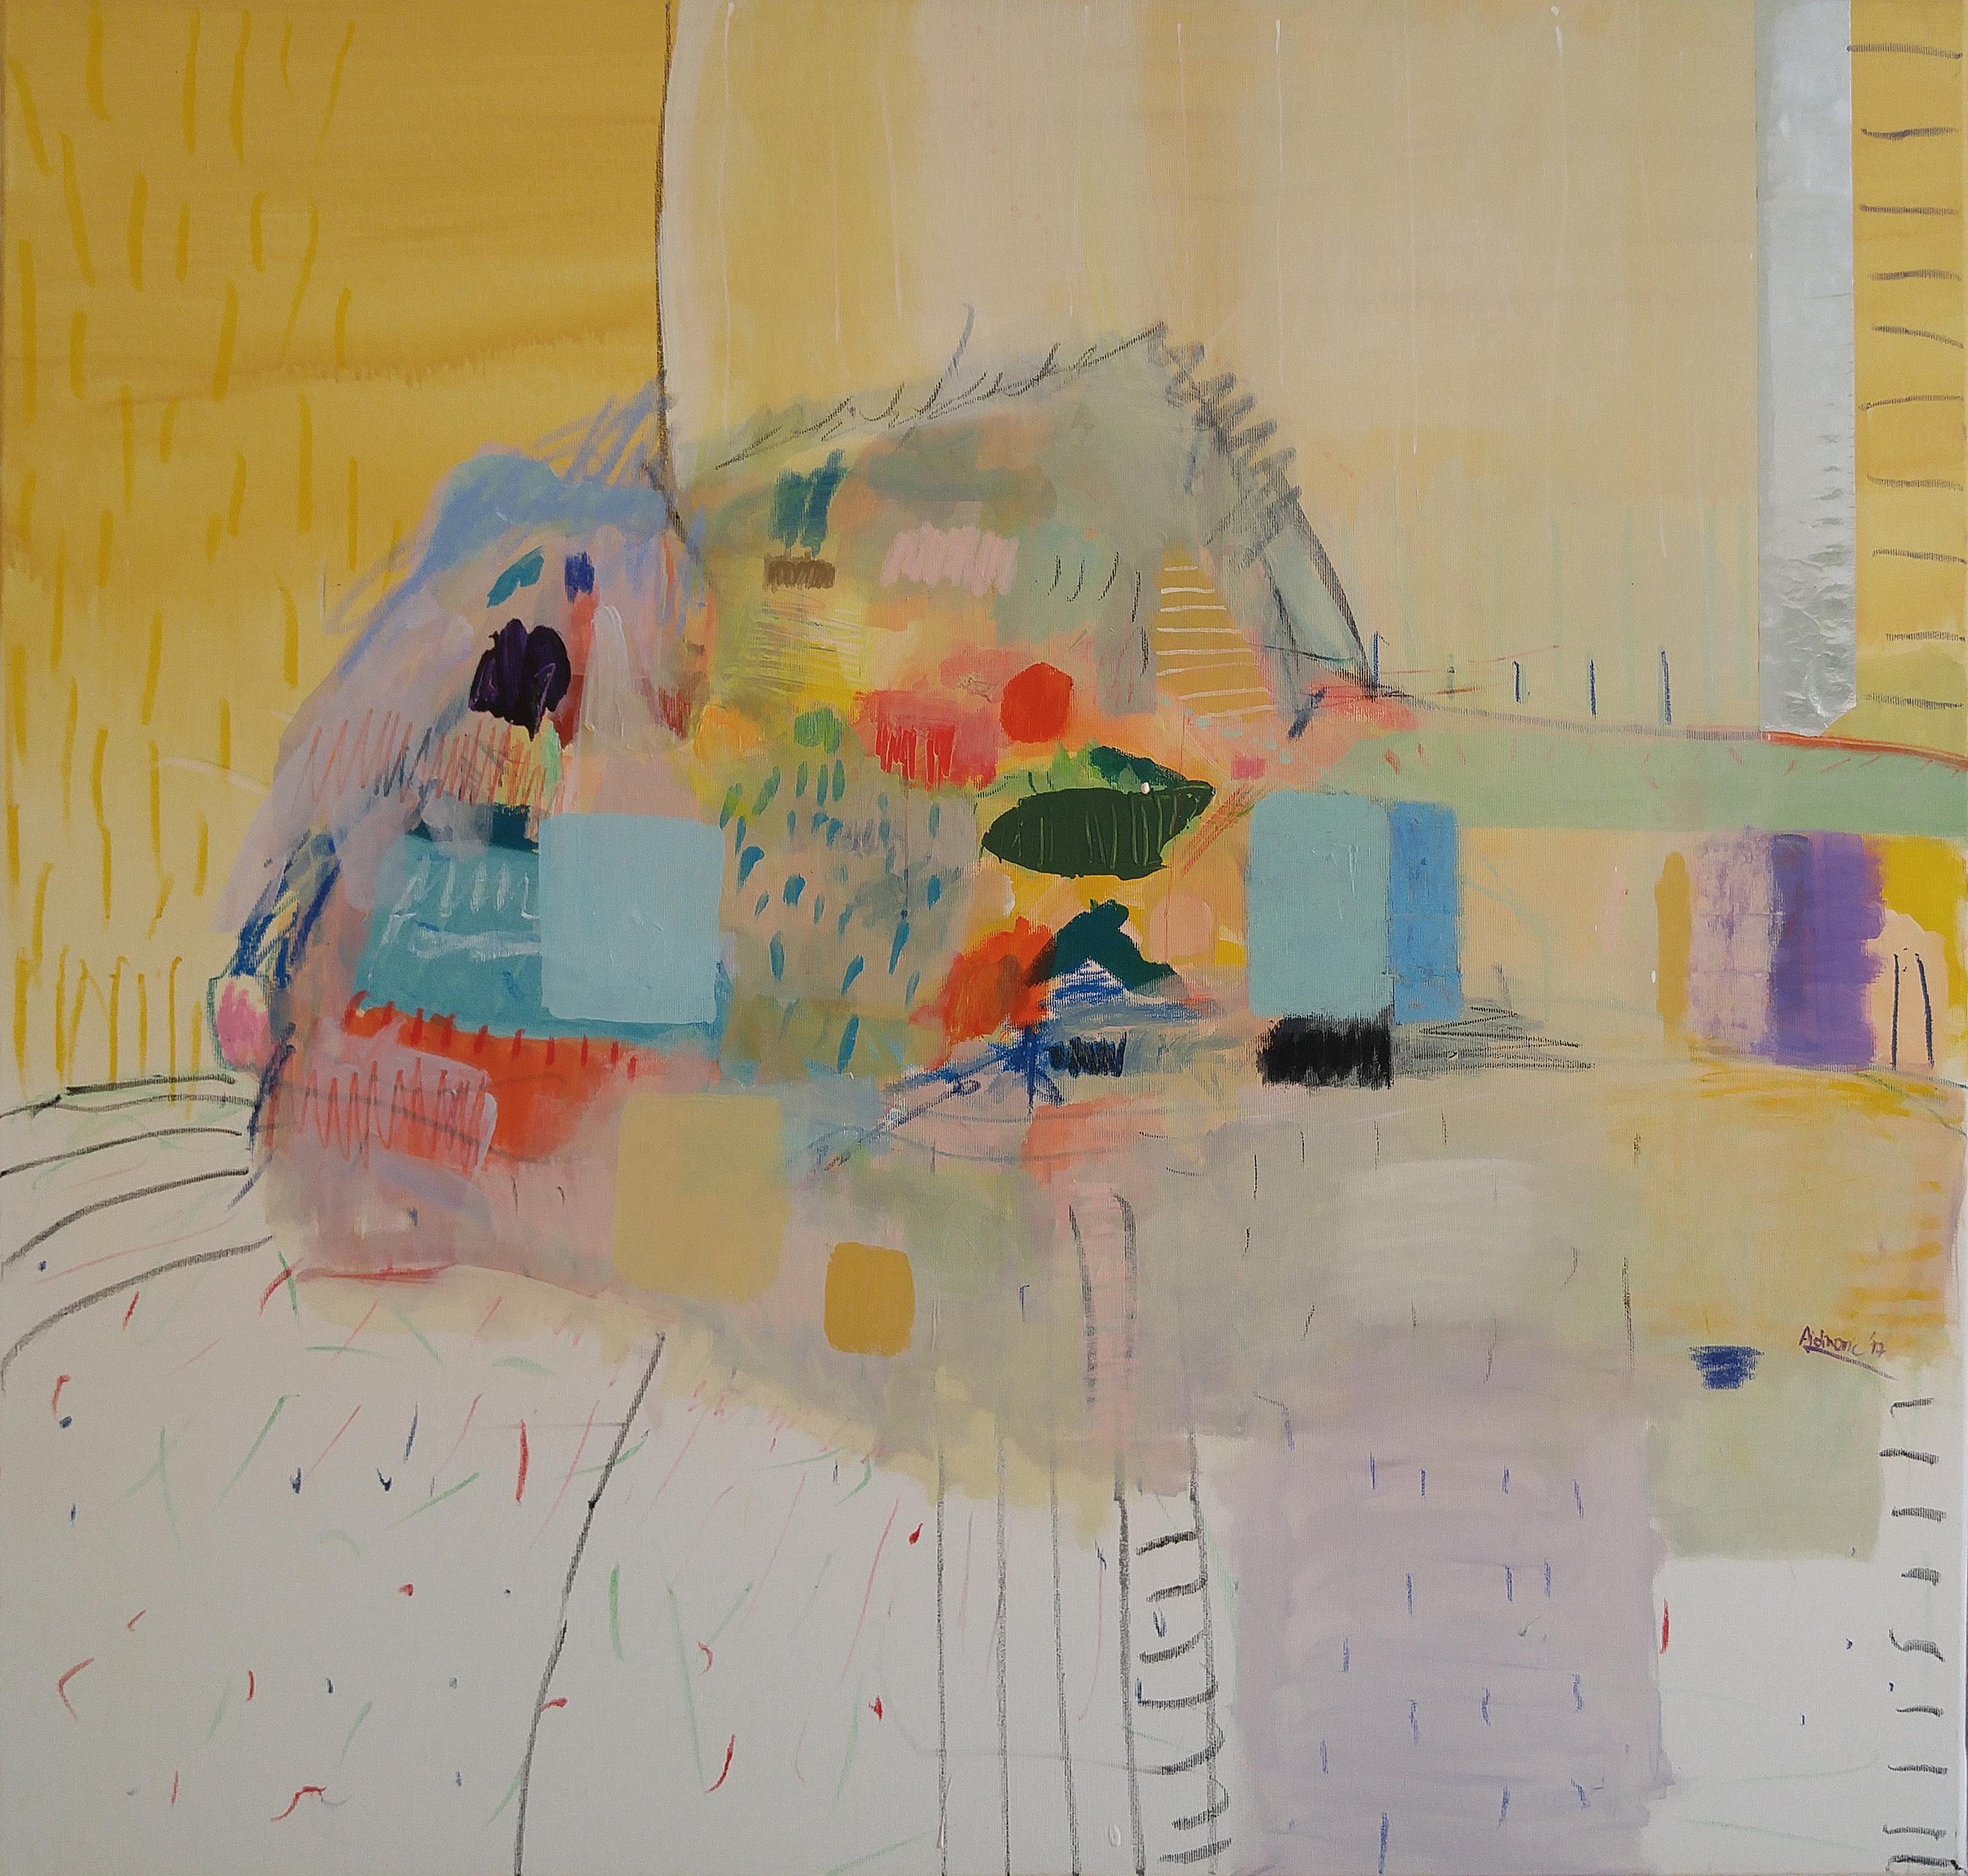 moderna slika za stan na platnu_apstraktna umjetnost veliki format 100 x 100 cm_ranko ajdinovic